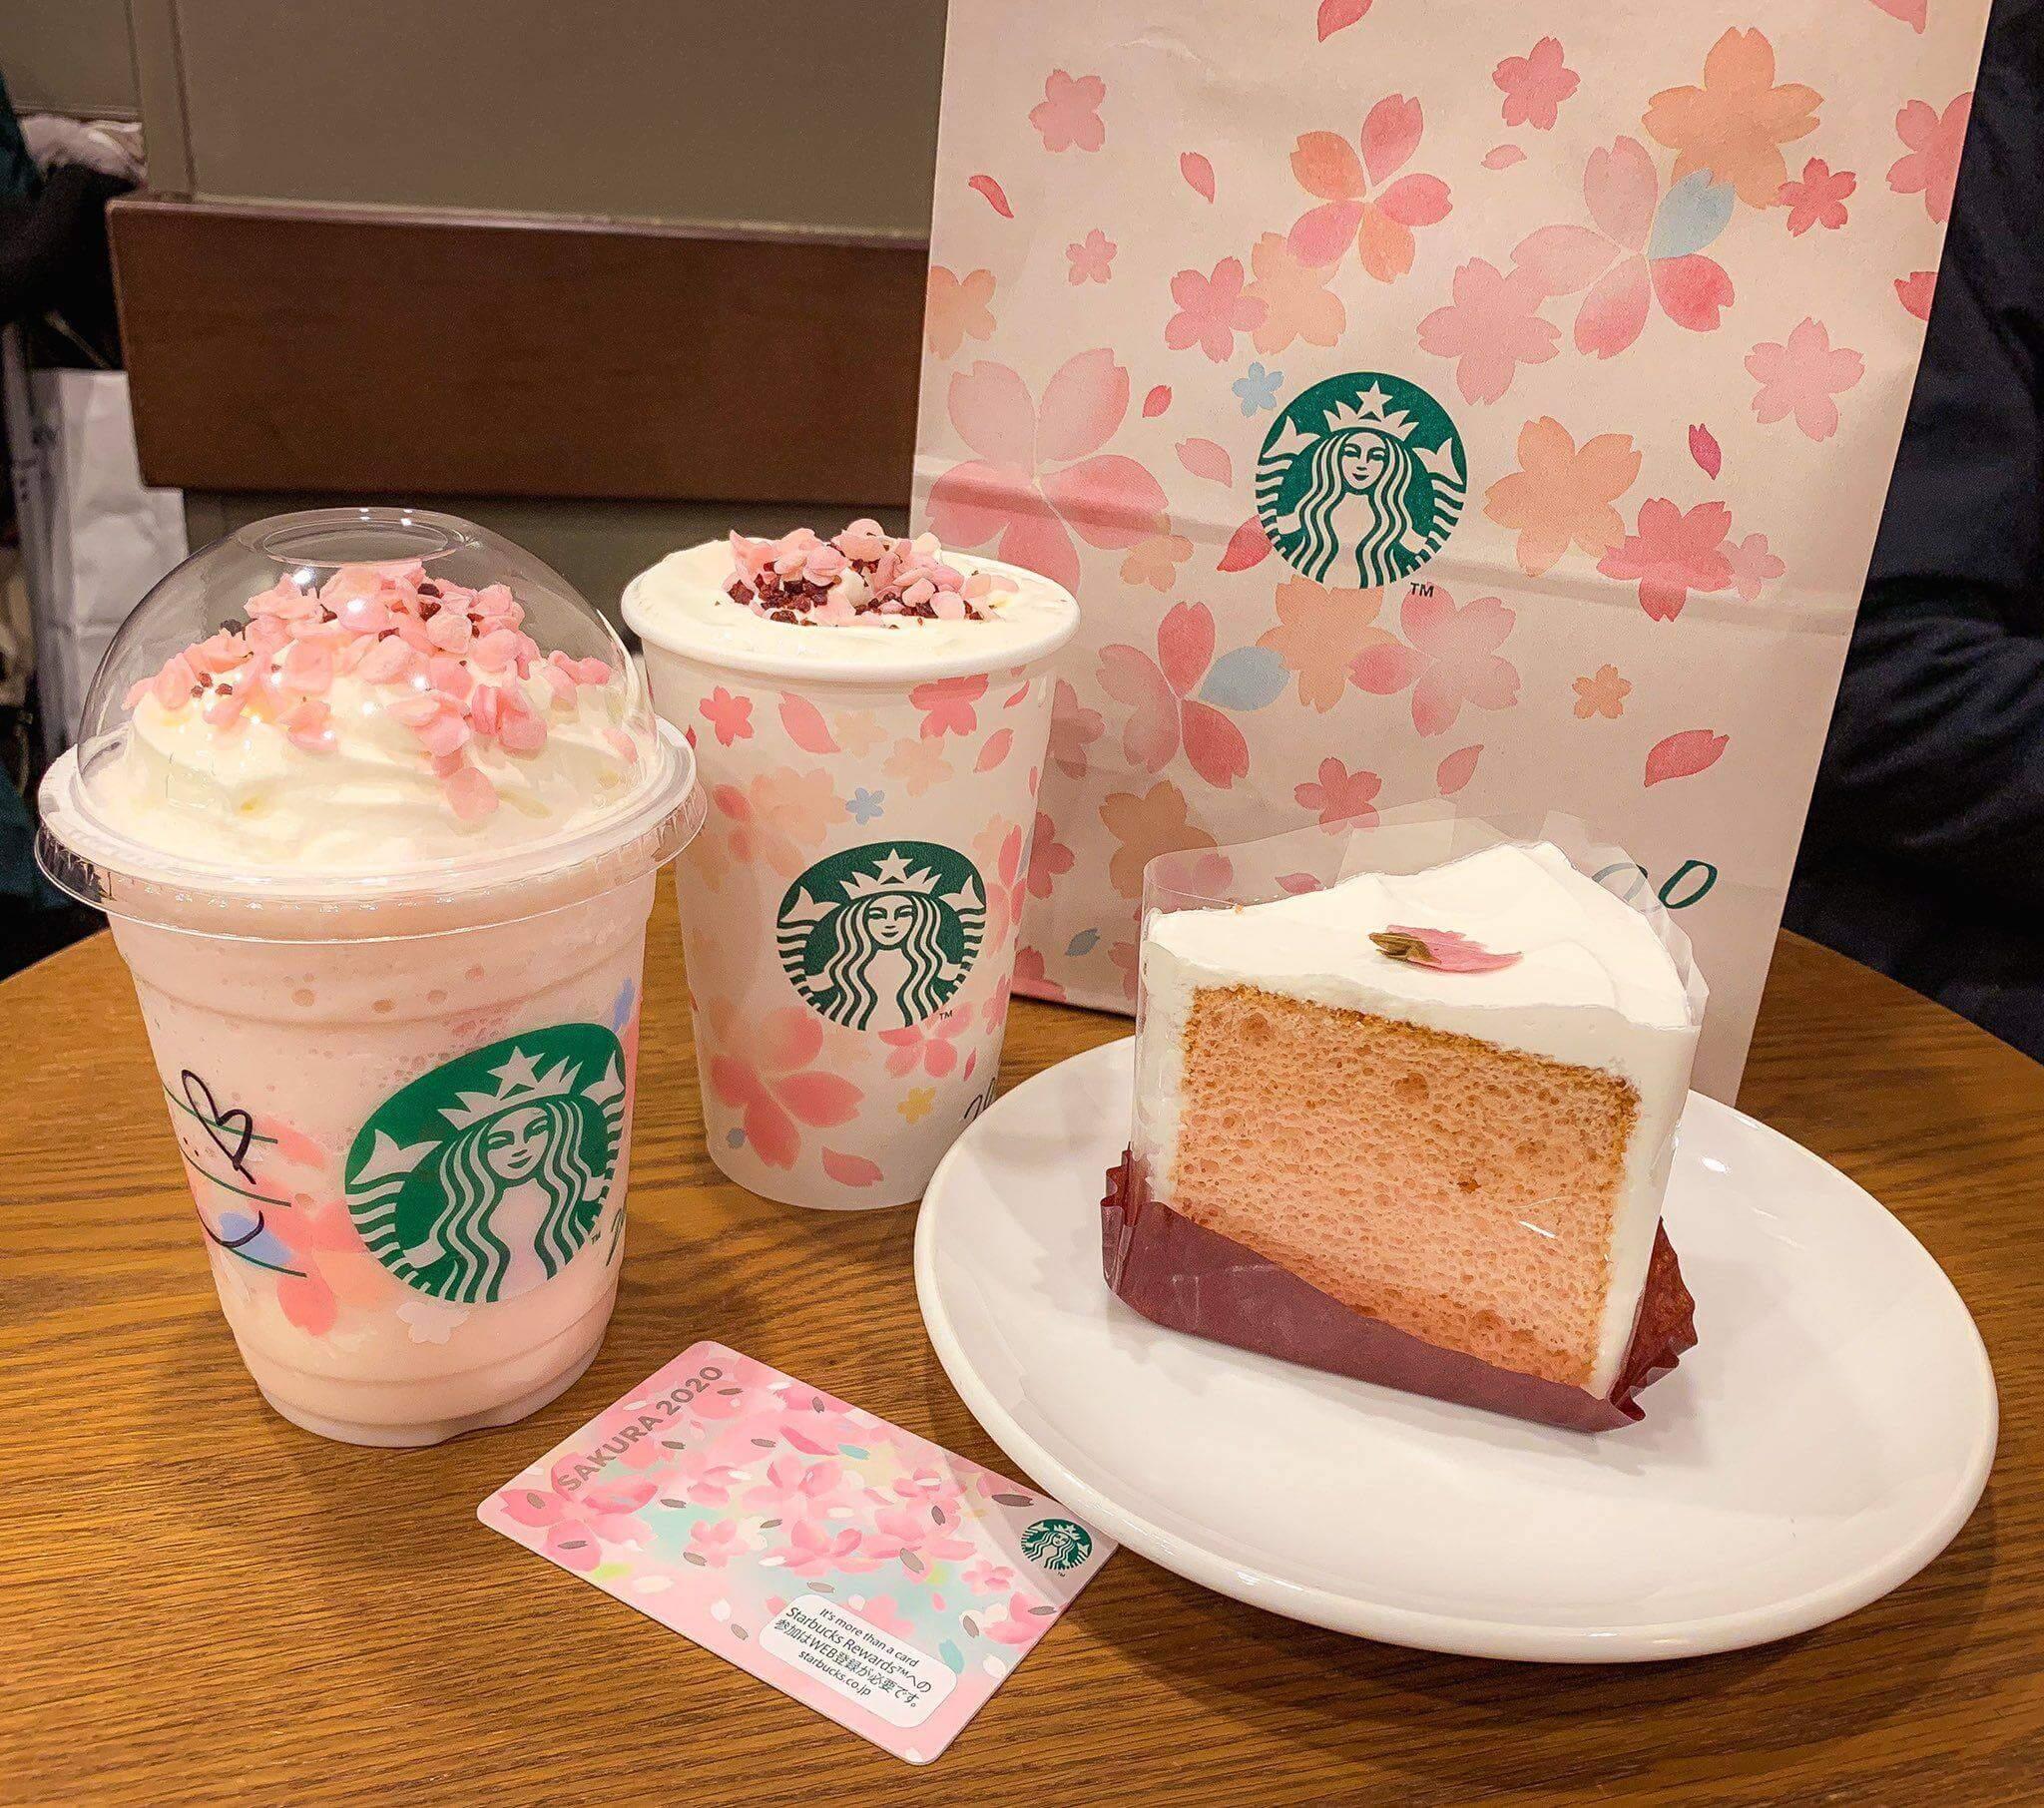 Starbucks Japan's Sakura Beverages and Cake